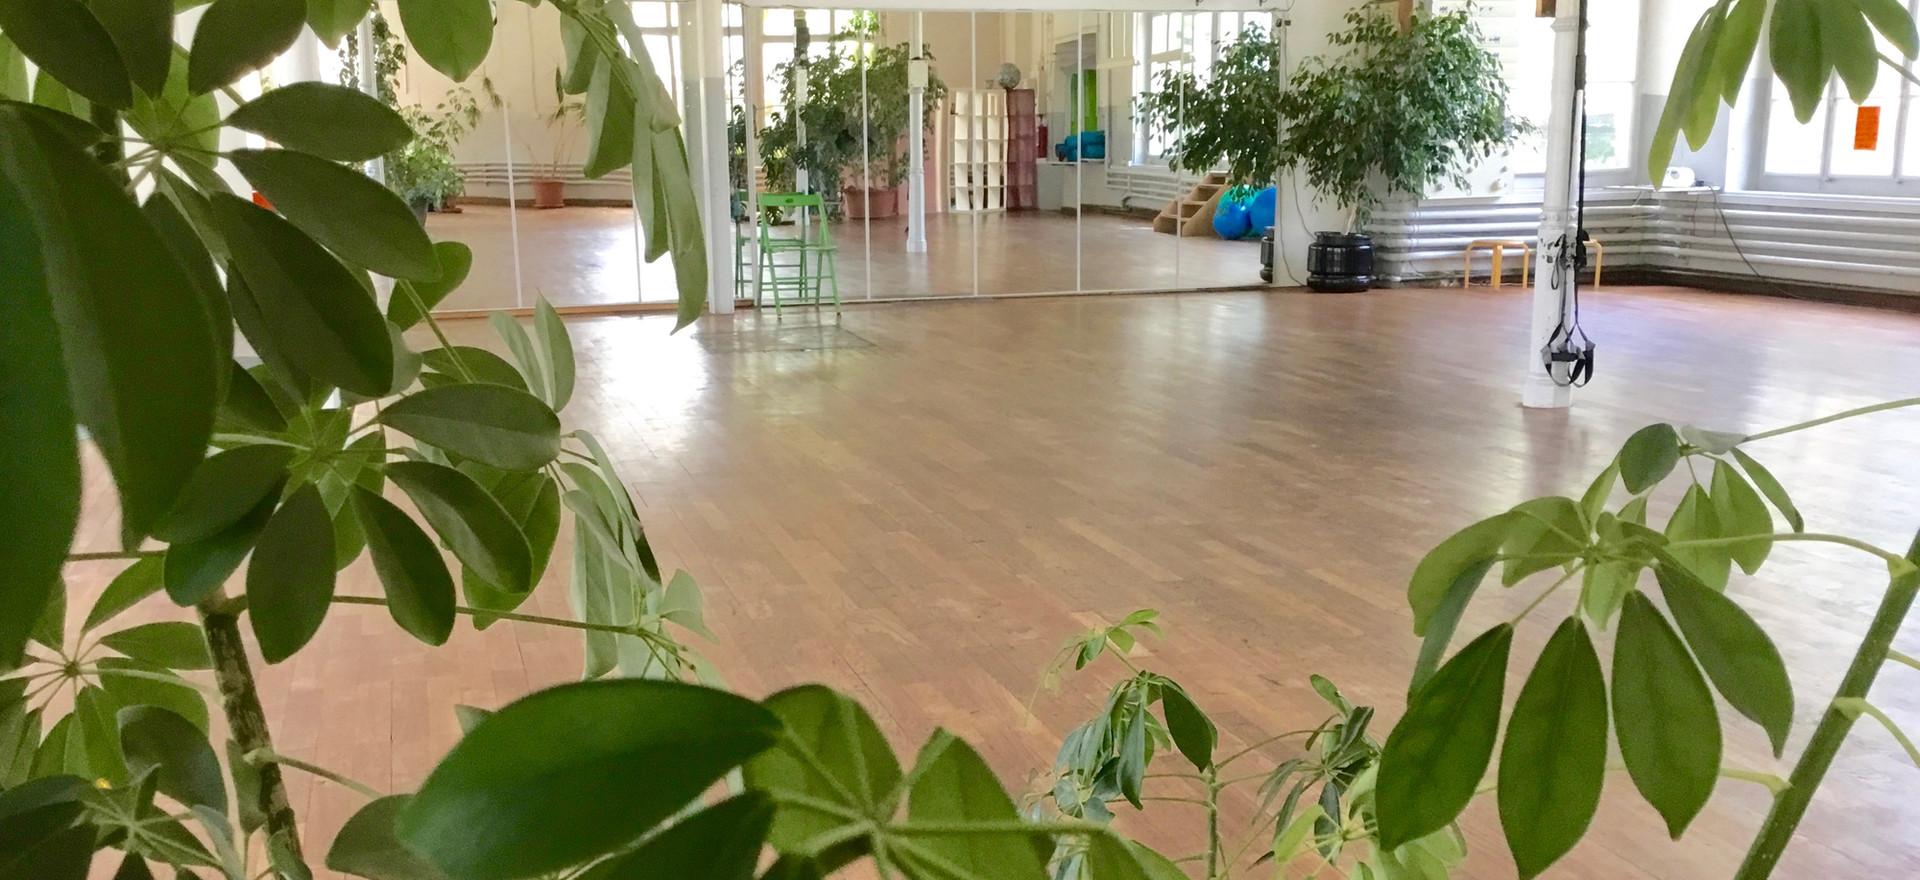 Tanz Atelier Rapperswil